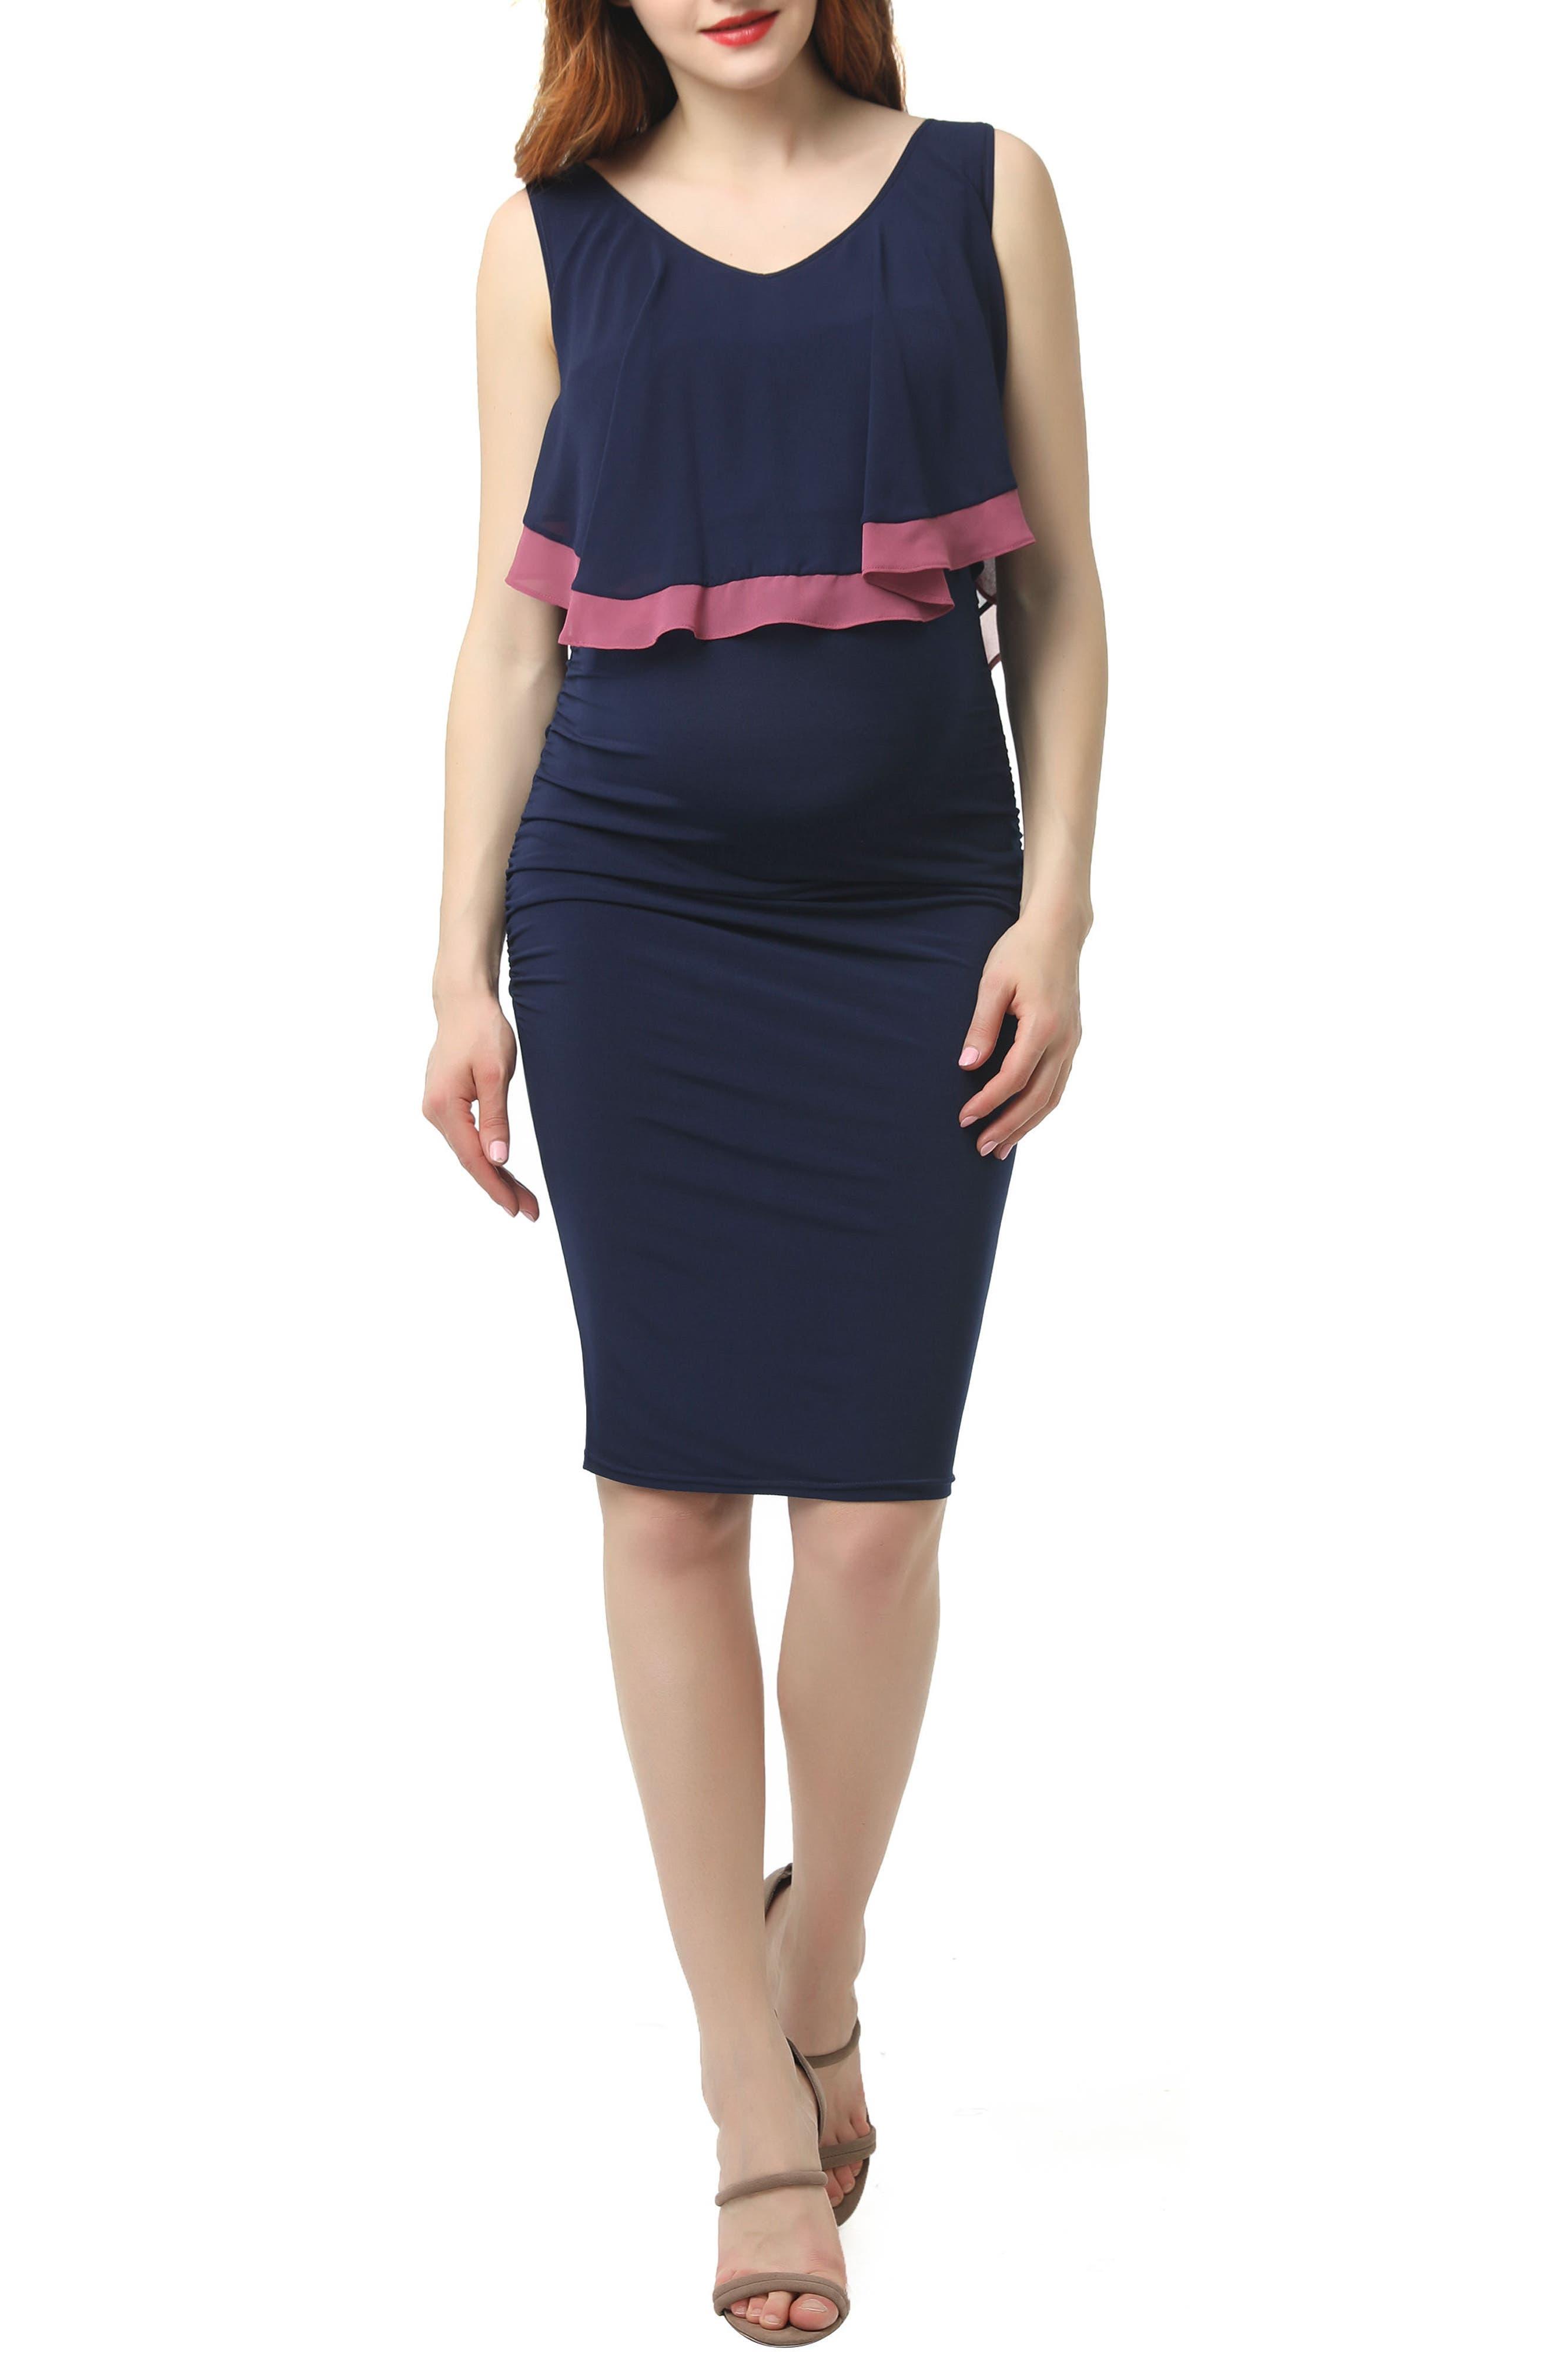 Vintage Maternity Dresses and Clothes Womens Kimi And Kai Melissa Body-Con Maternitynursing Dress $61.60 AT vintagedancer.com